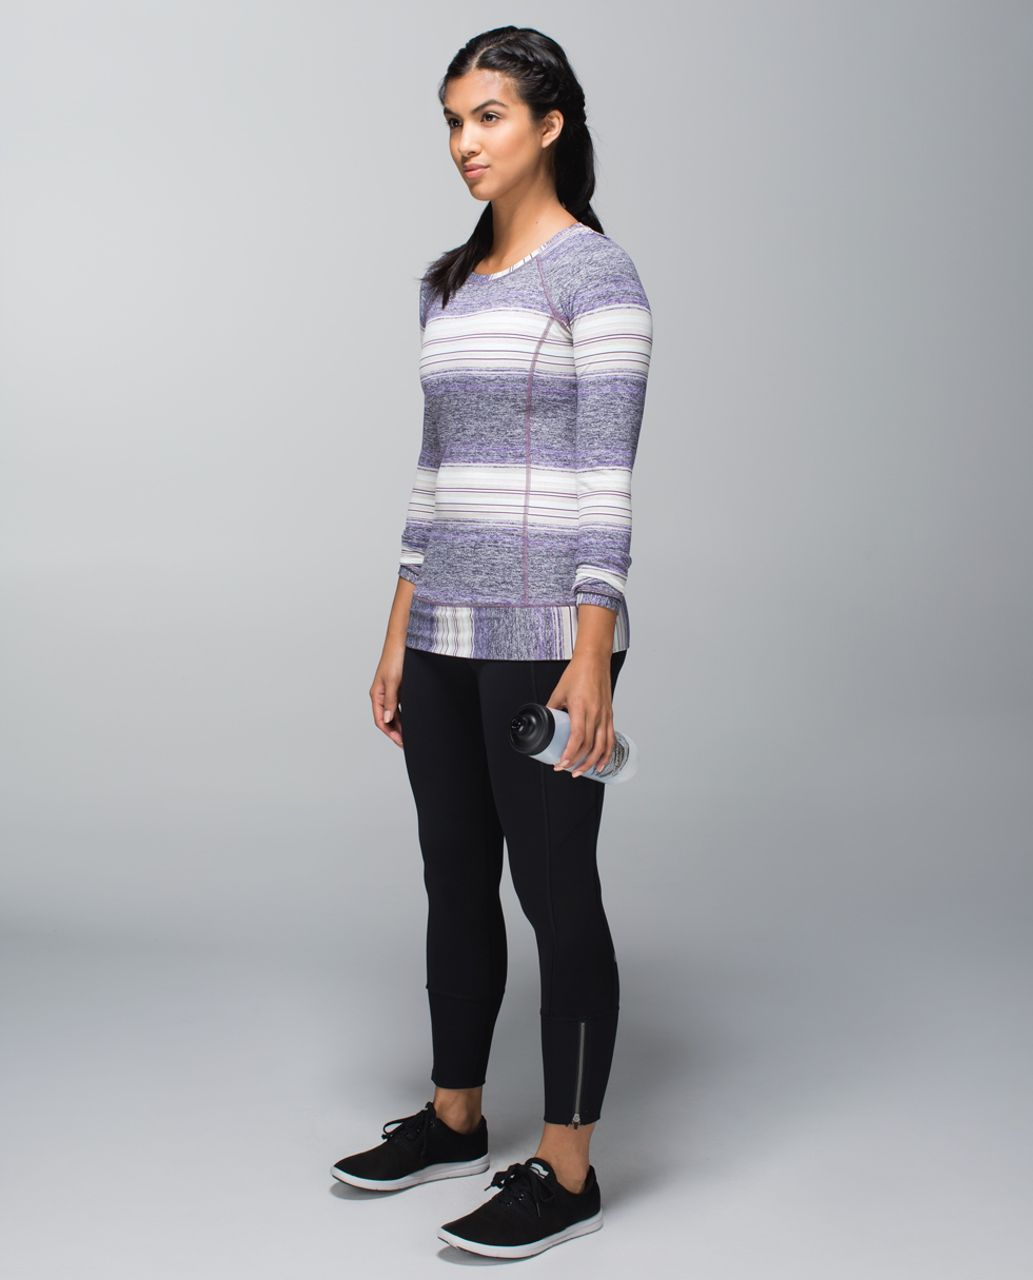 Lululemon Race Your Pace Long Sleeve - Osaka Stripe Heathered Black Grape